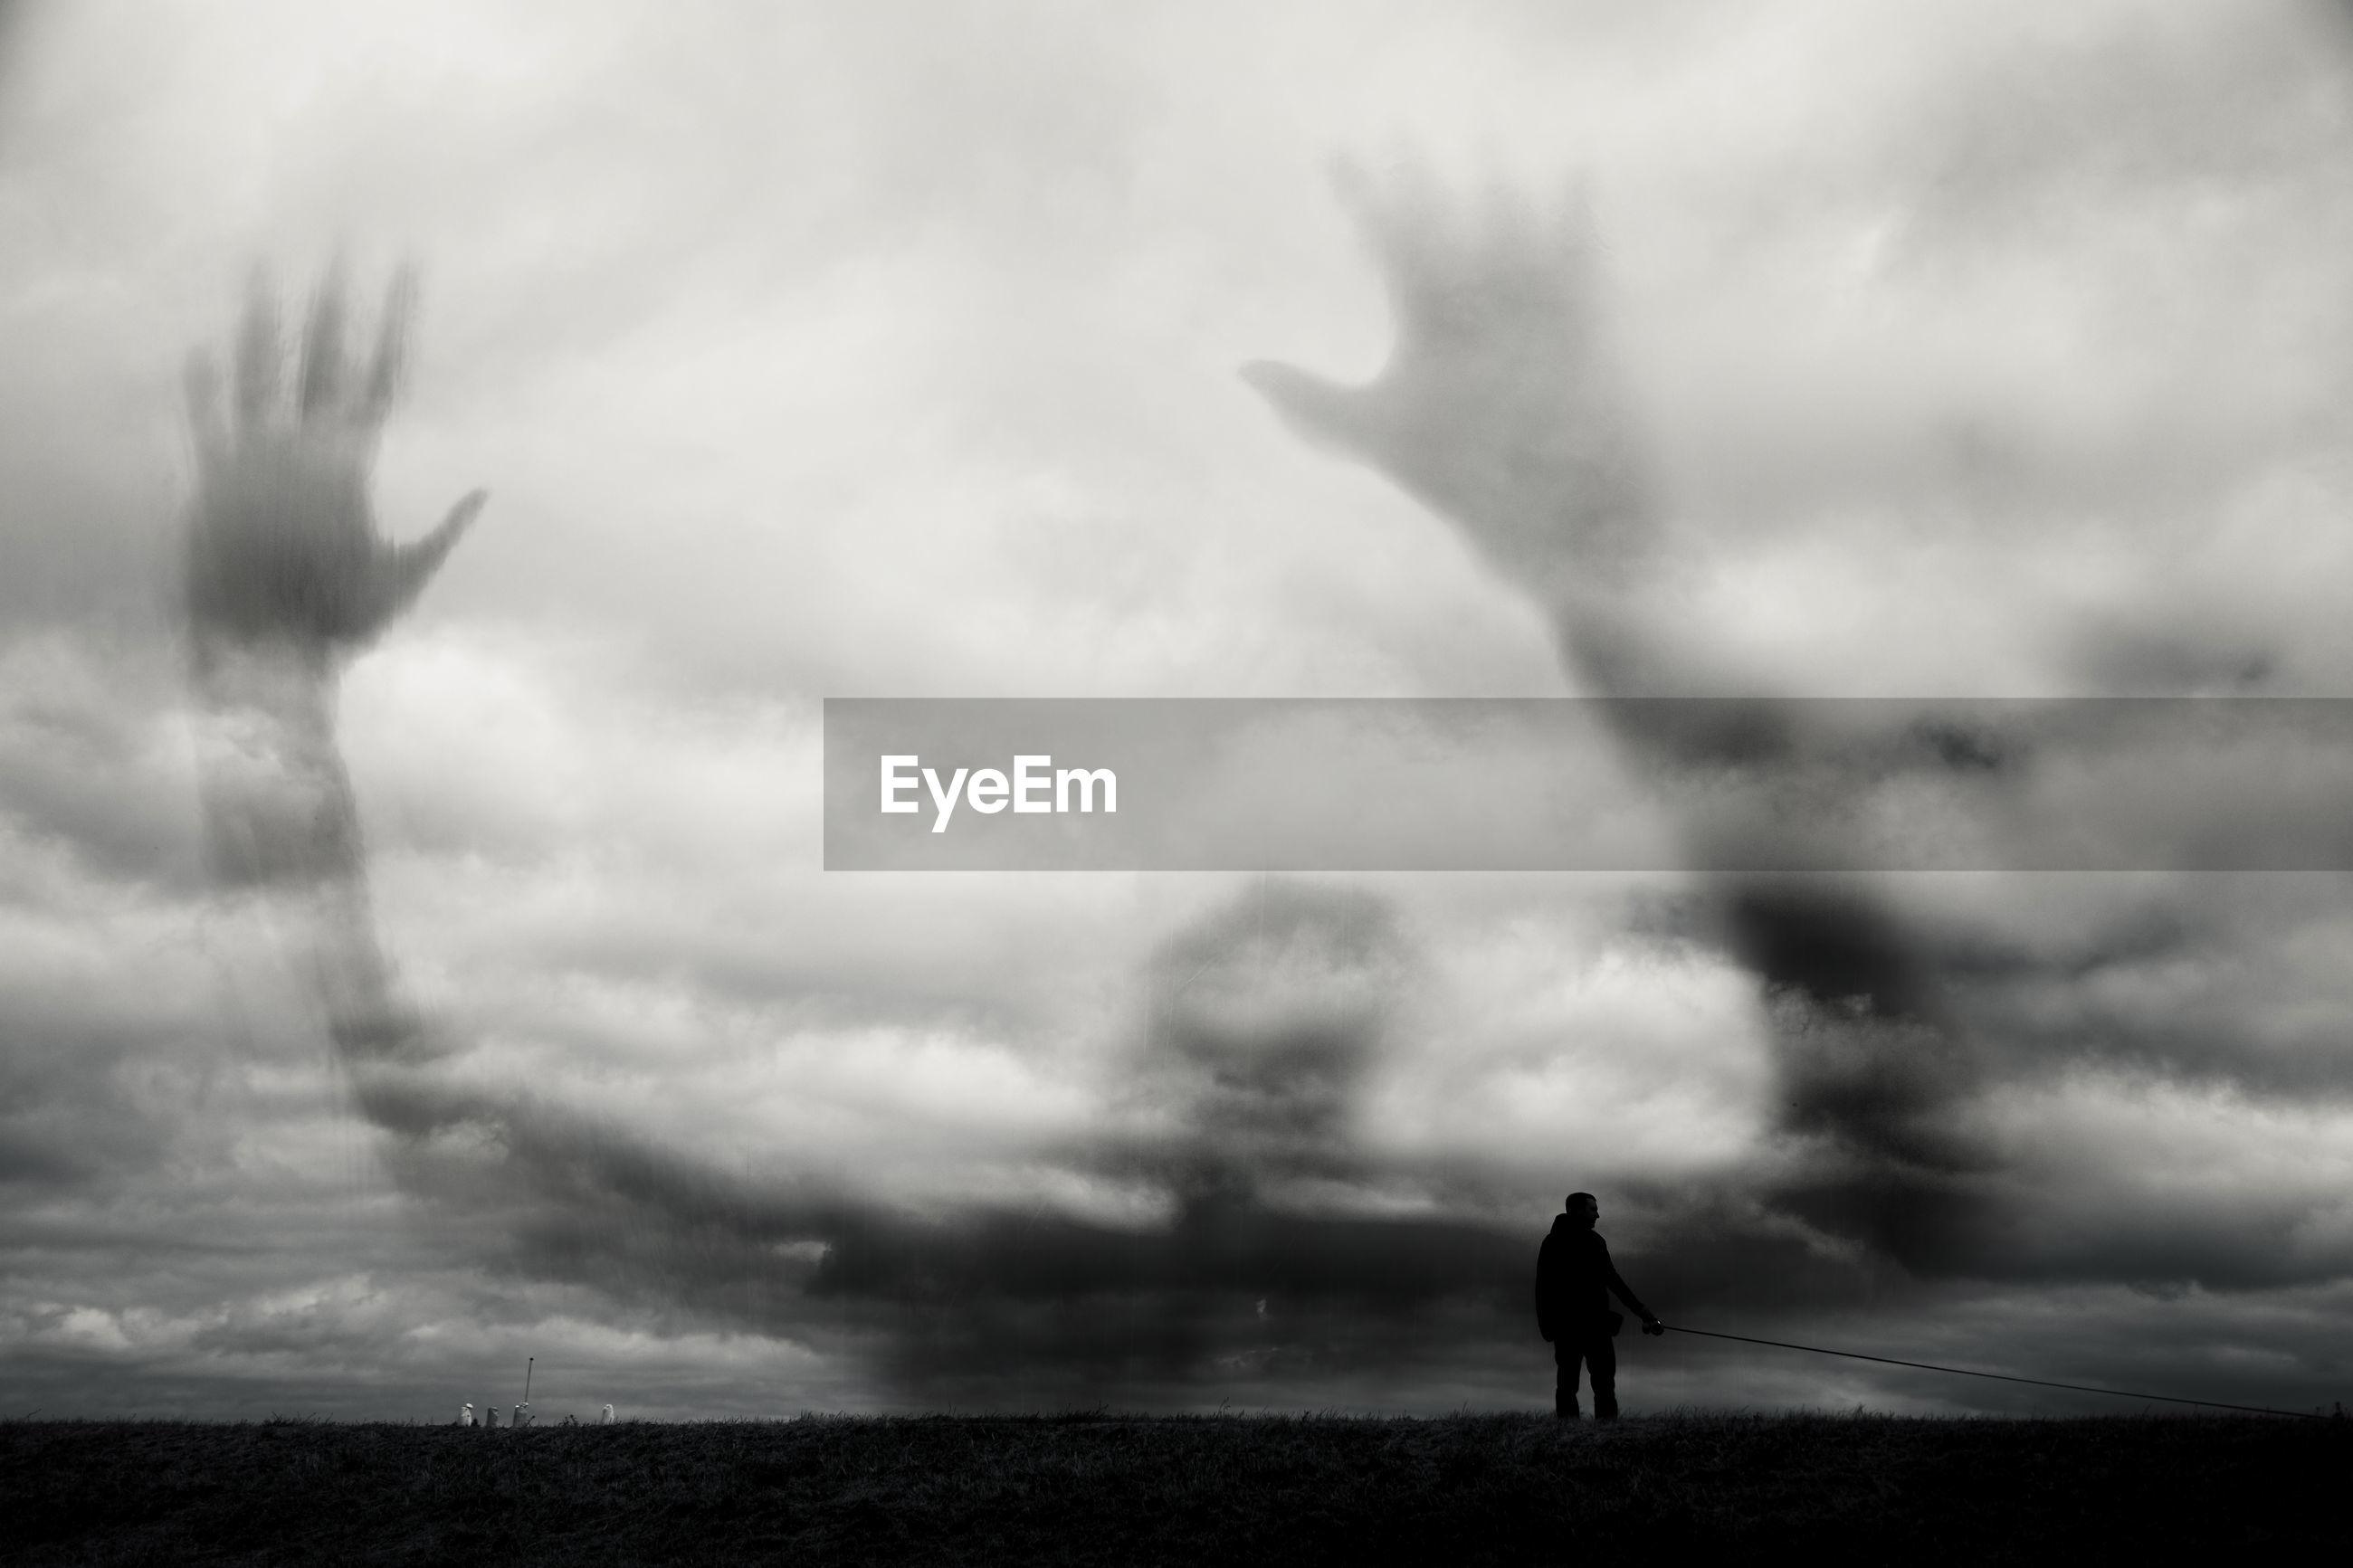 SILHOUETTE MAN WALKING AGAINST CLOUDY SKY